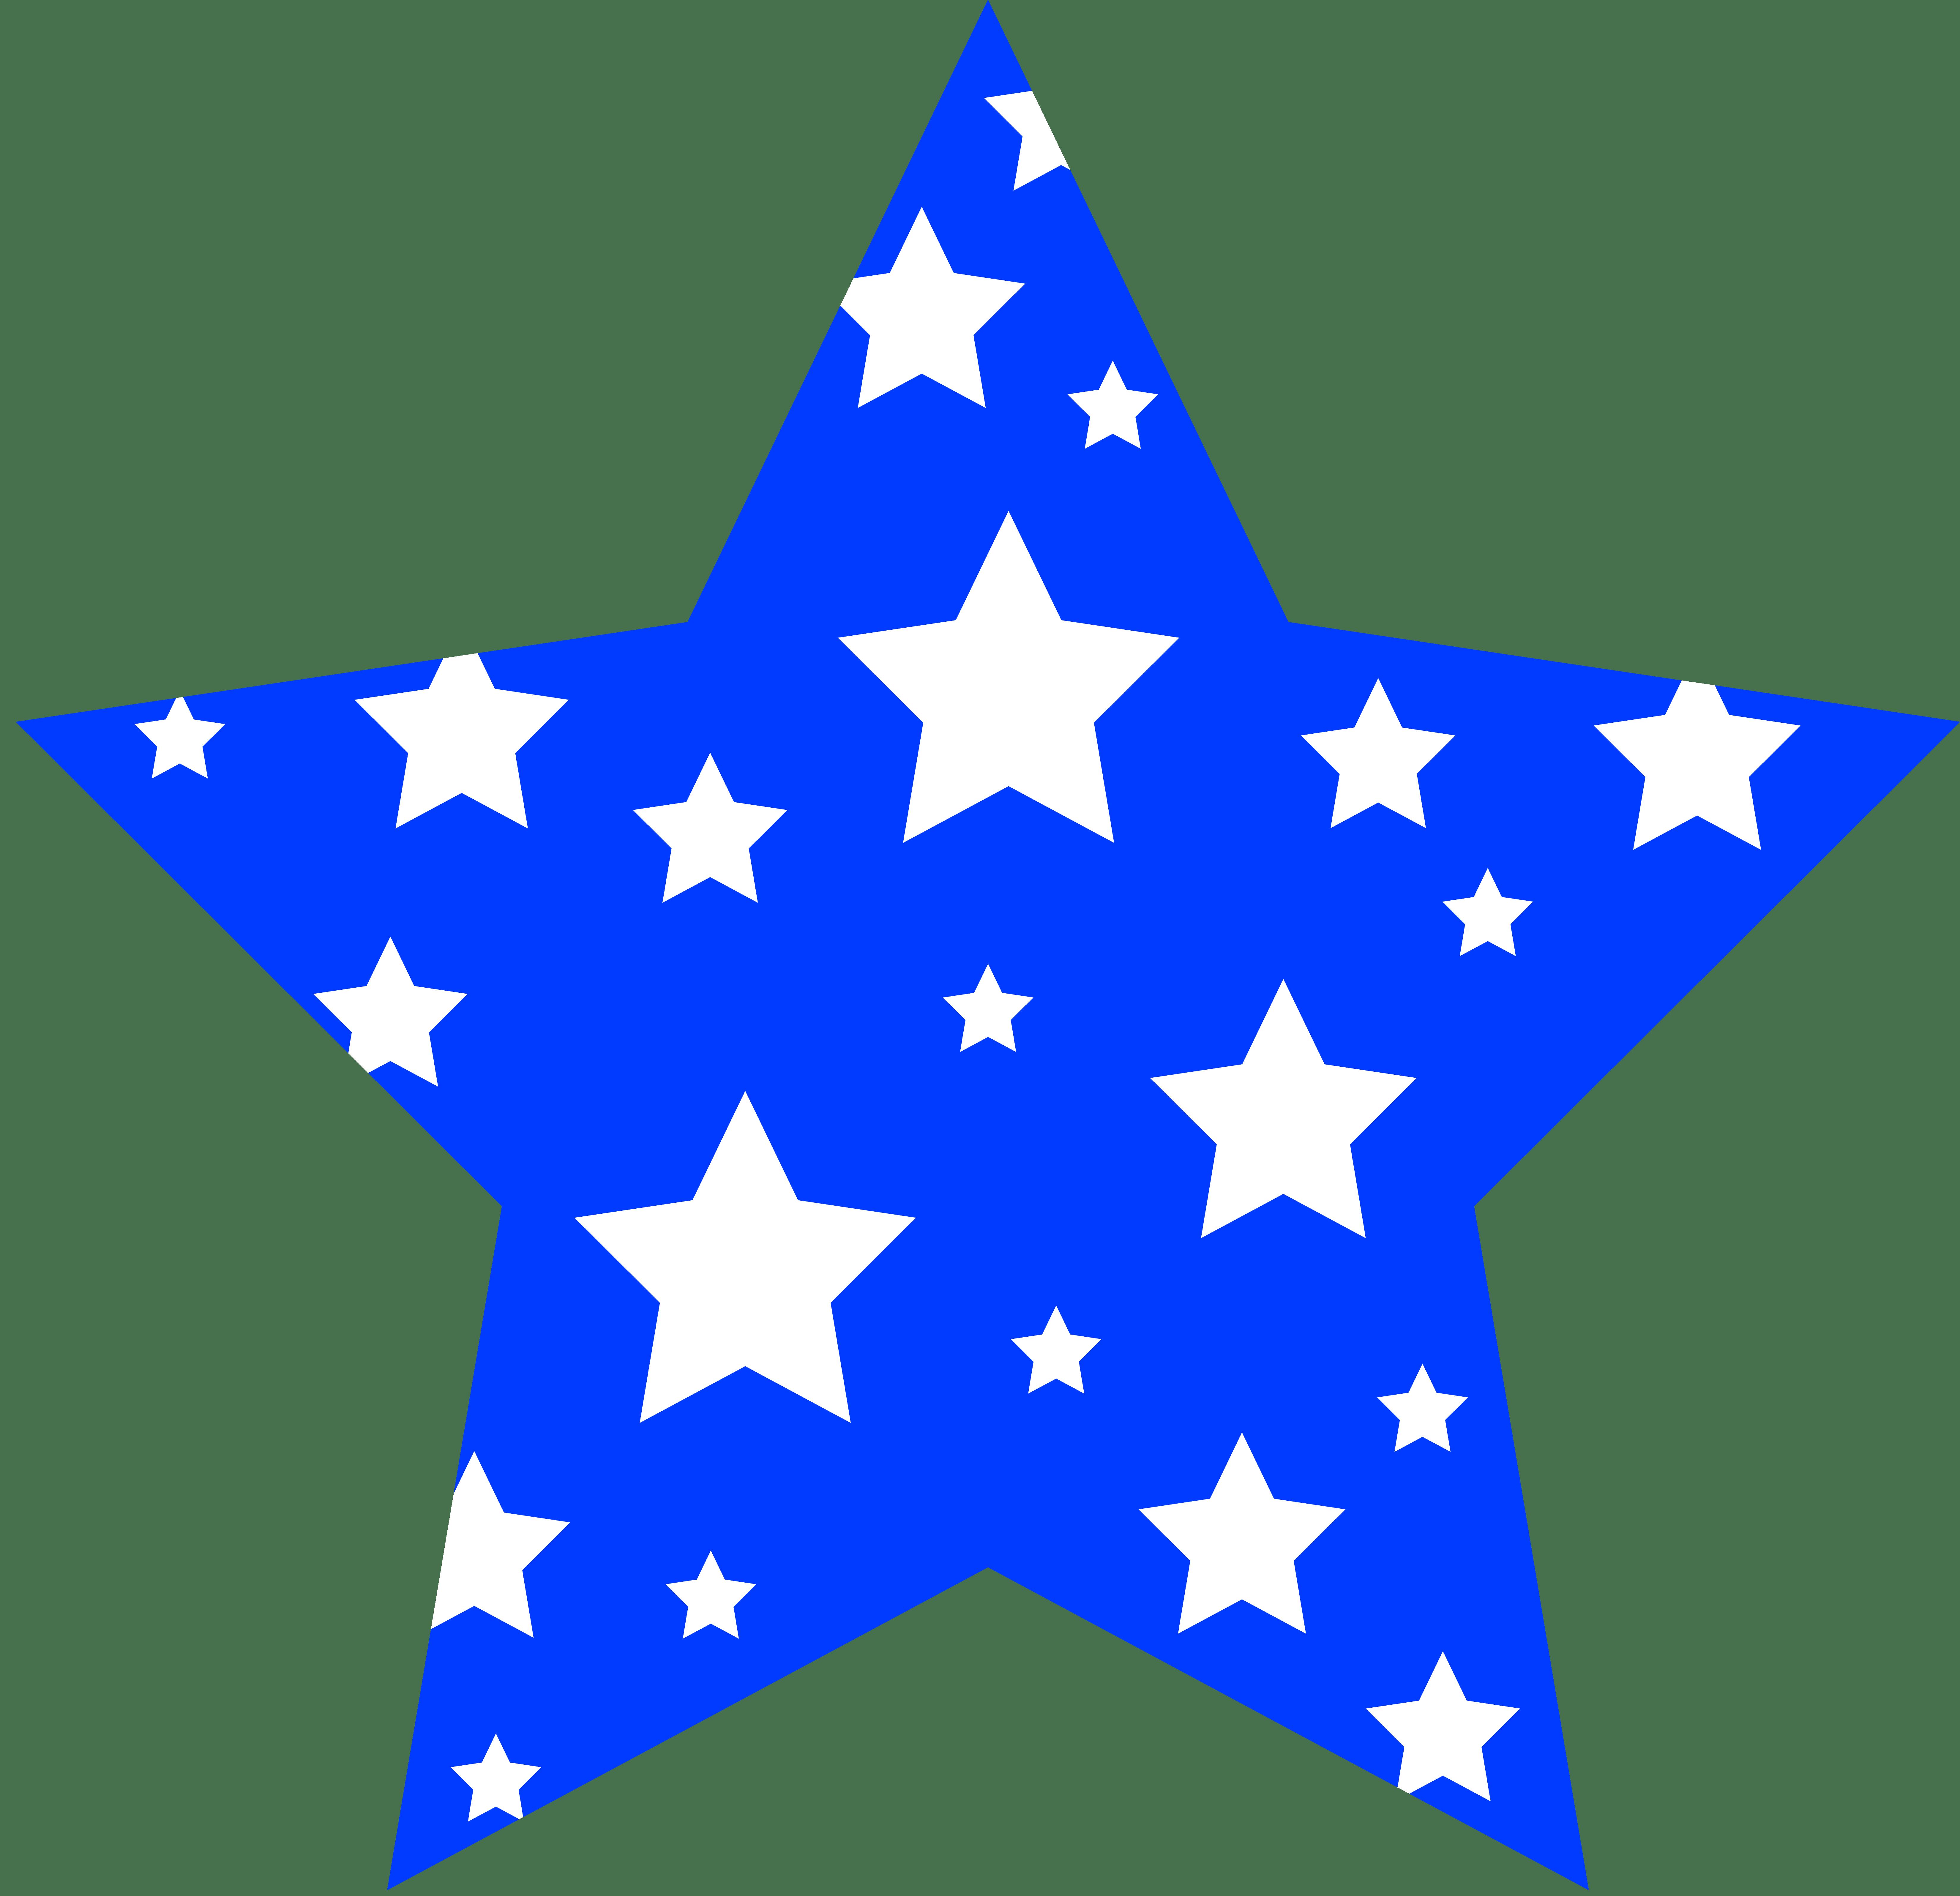 Microsoft clipart star png stock Microsoft clipart stars 7 » Clipart Portal png stock